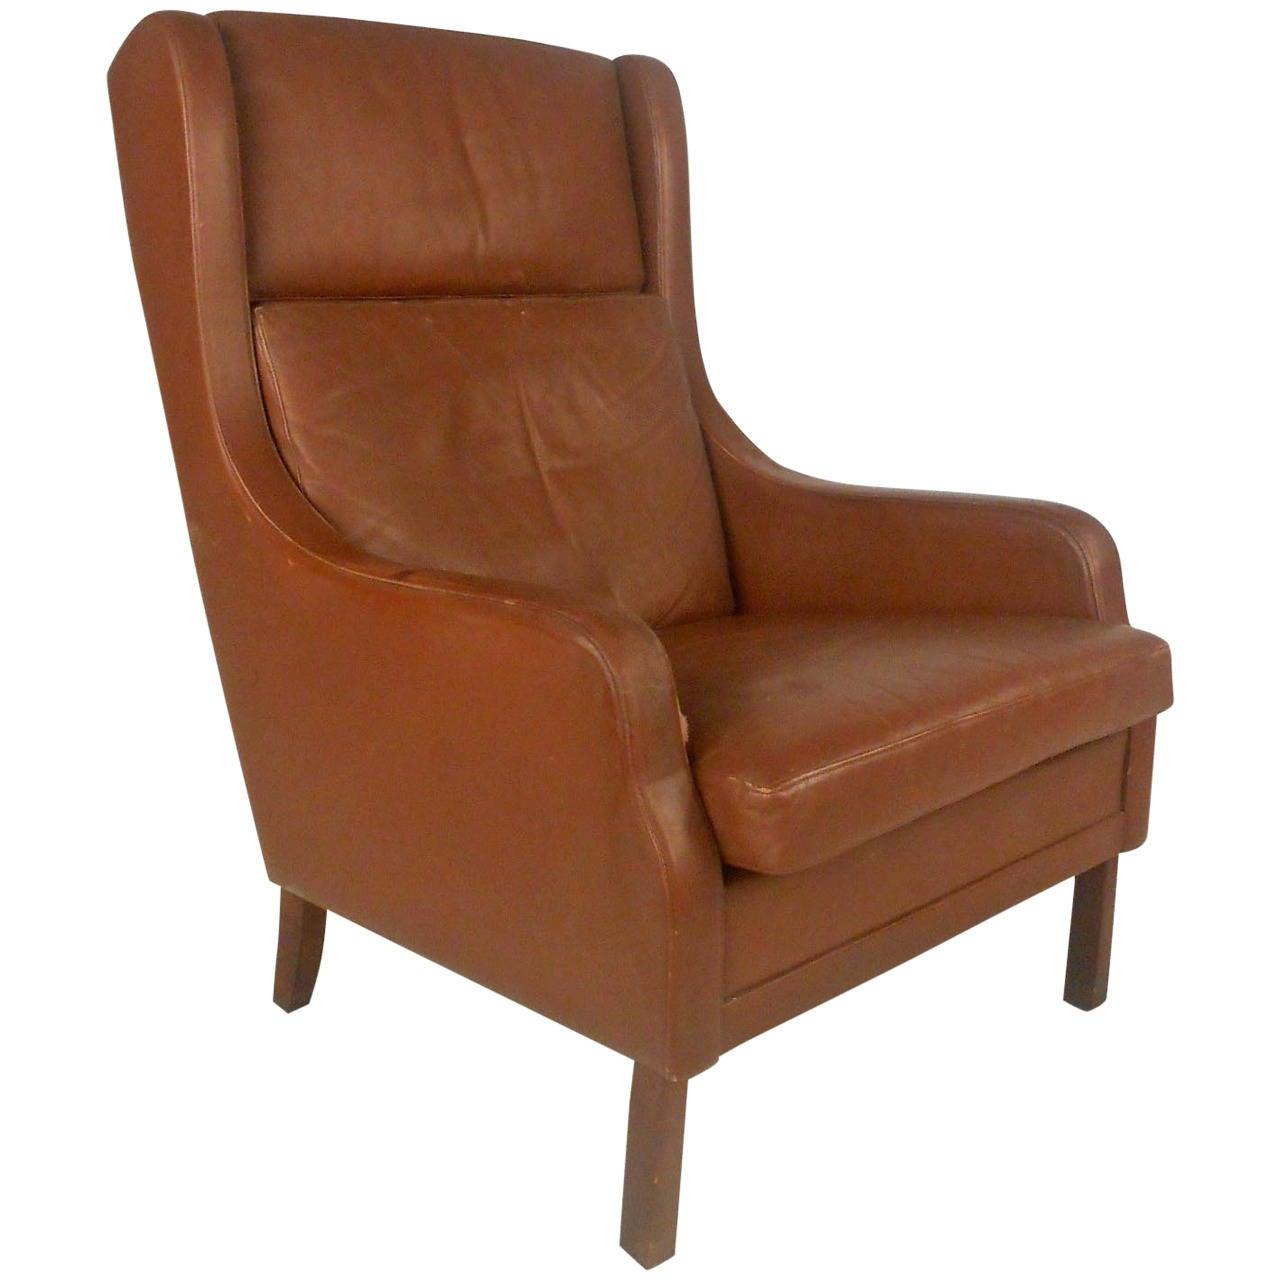 vintage designer chairs chair covers cotton unique mid century modern leather danish lounge